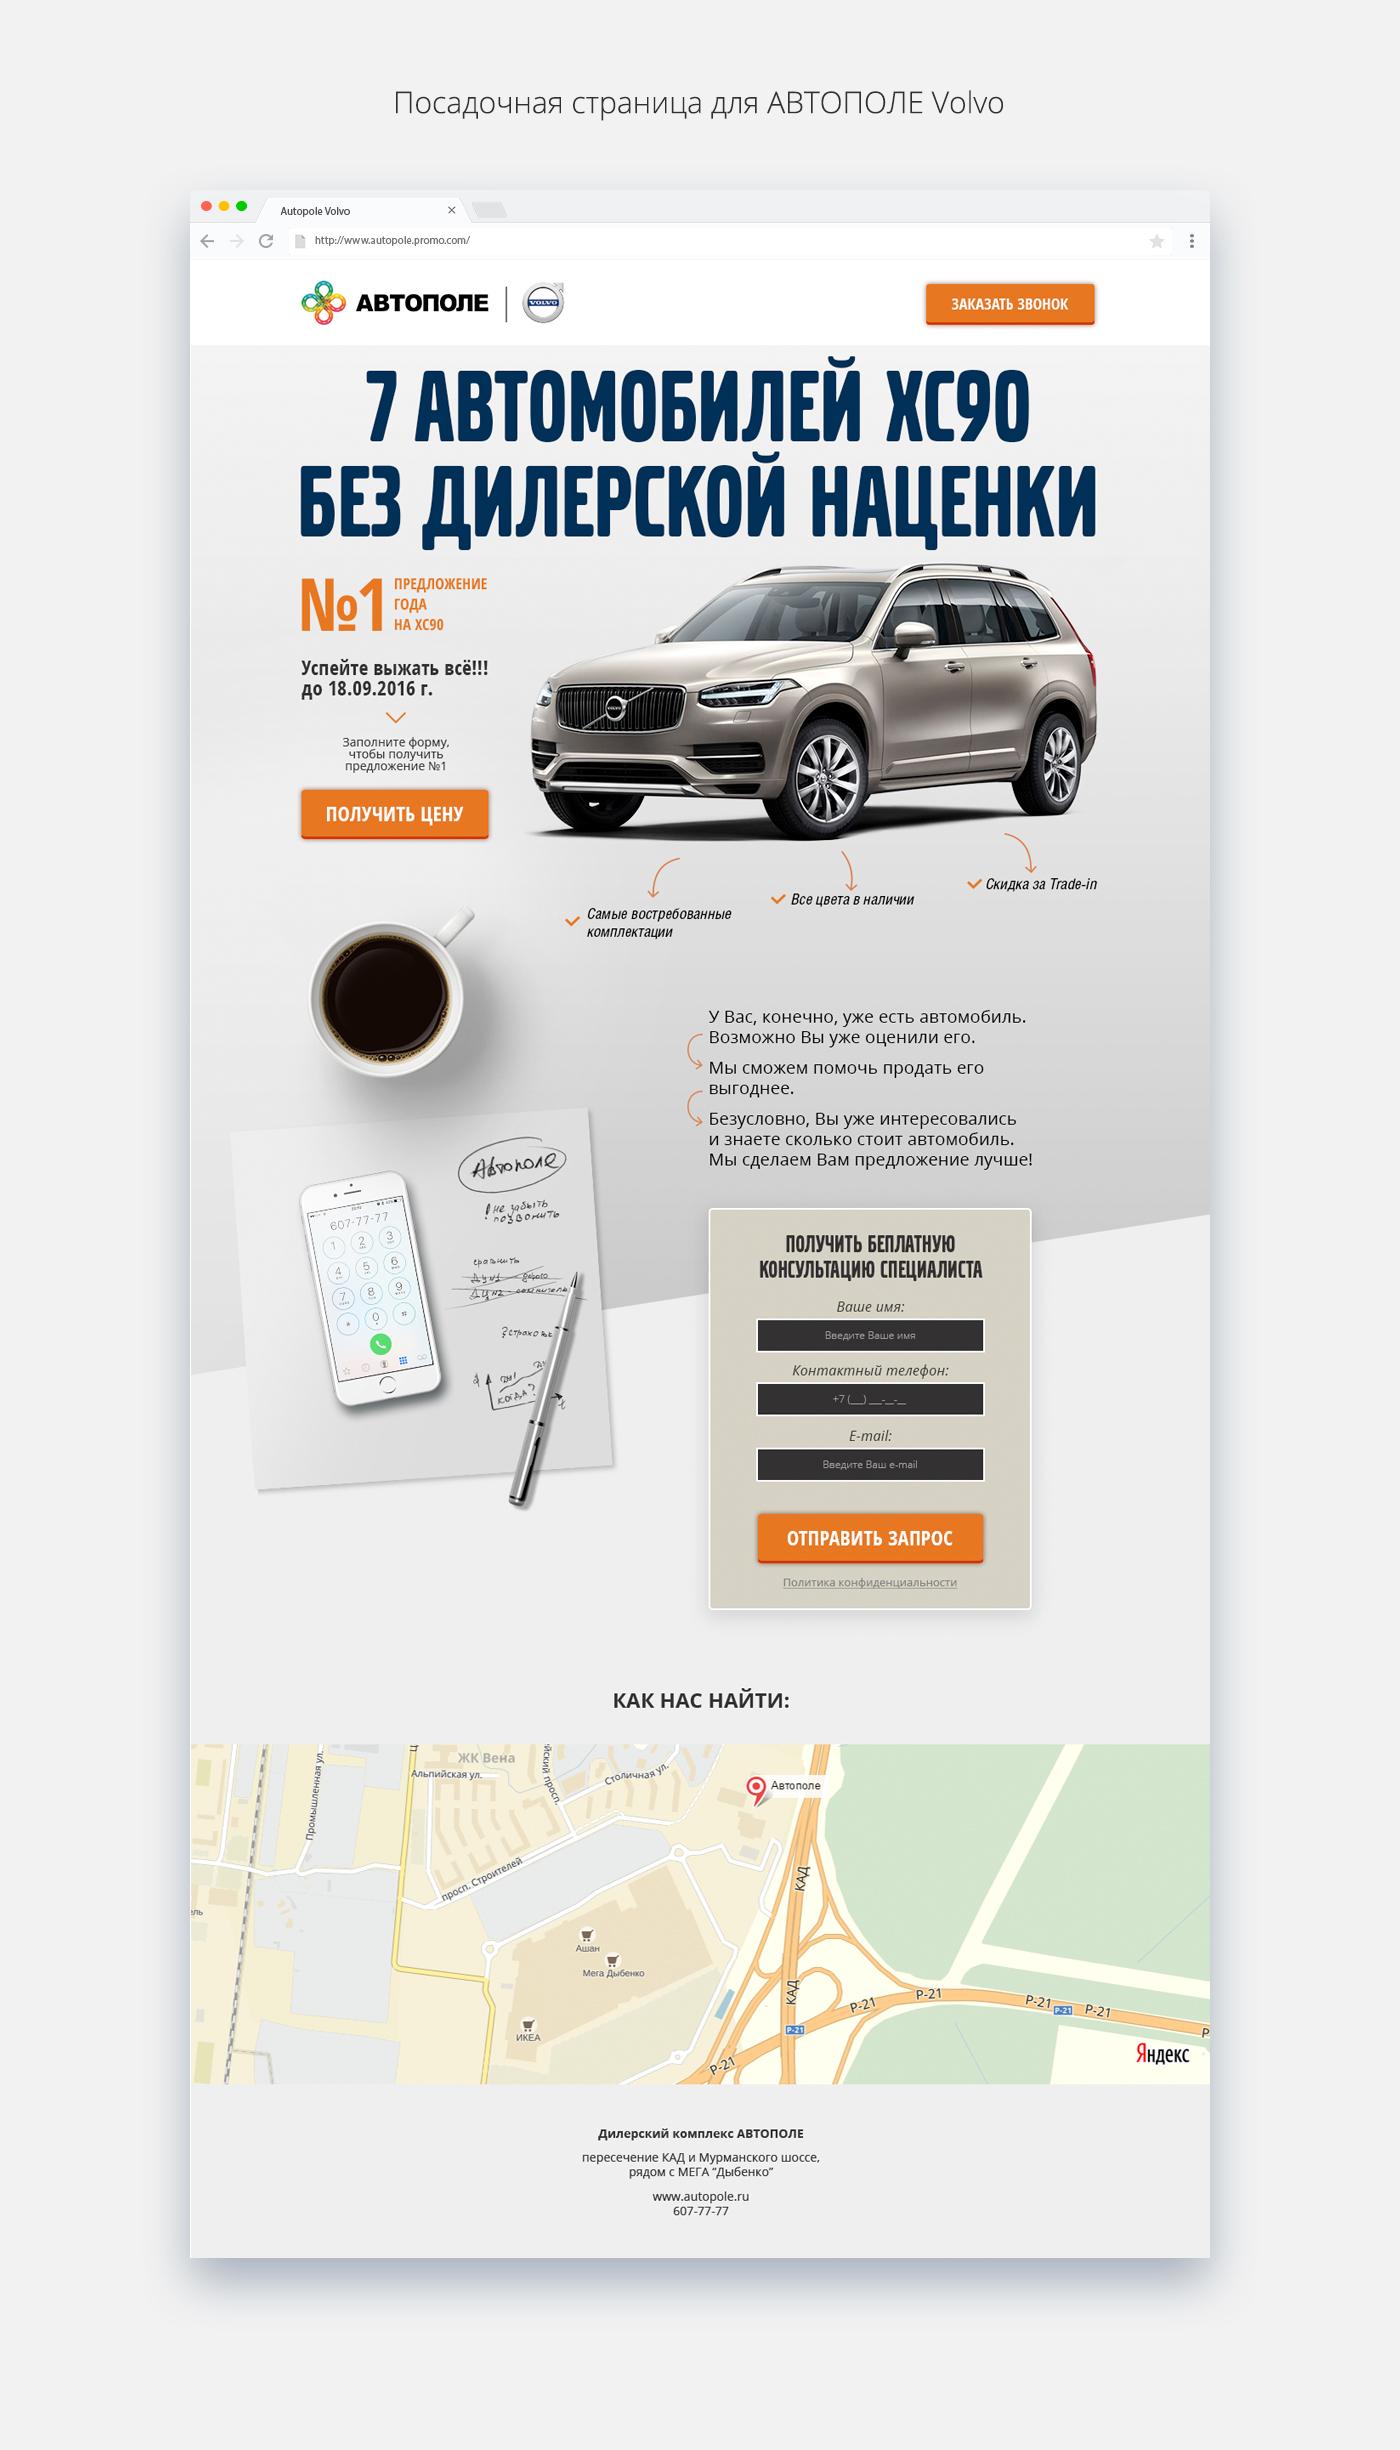 Посадочная страница АВТОПОЛЕ Volvo